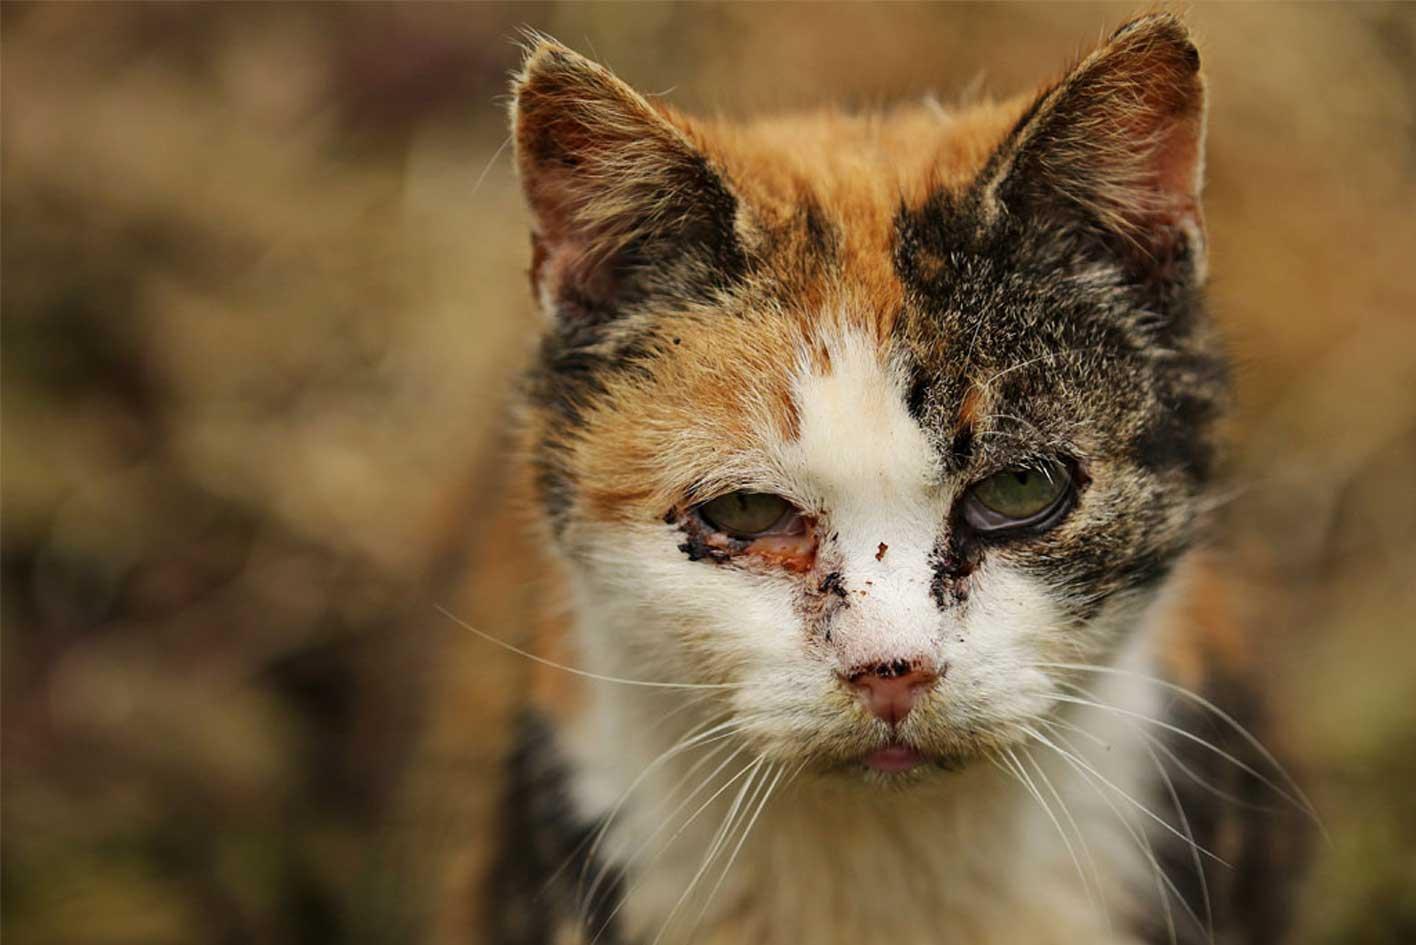 Katze mit Katzenschnupfen Symptome